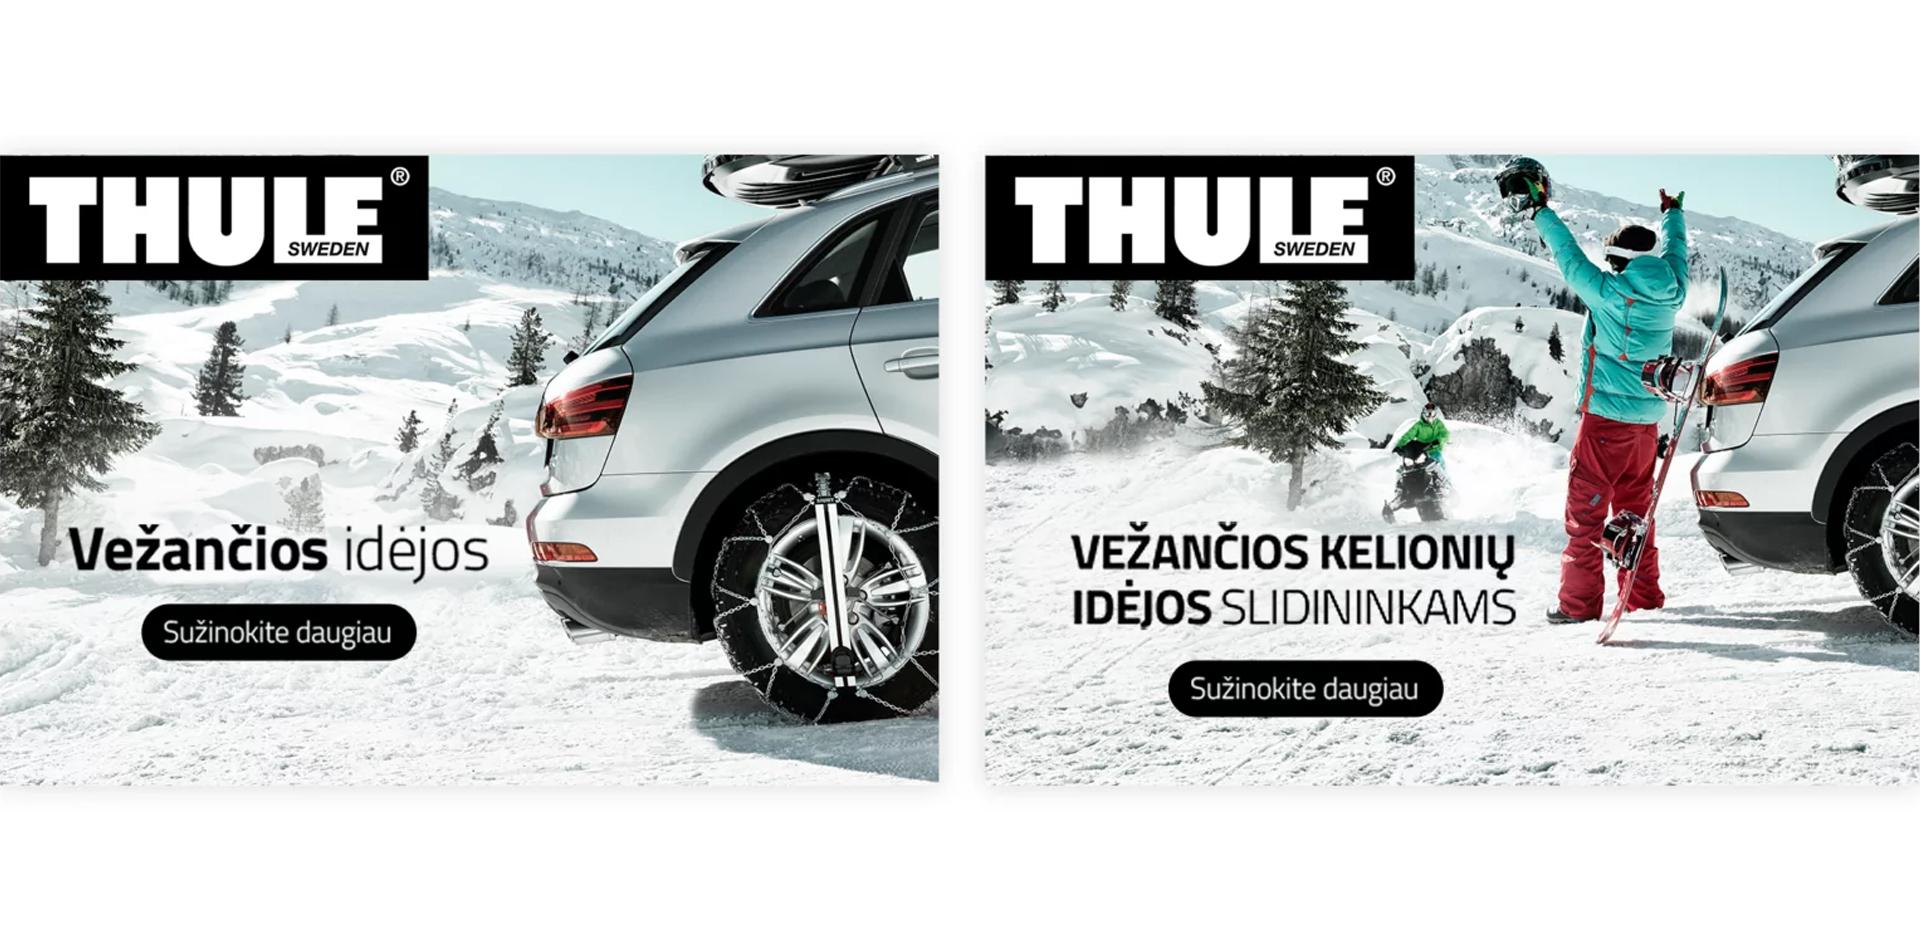 THULE2